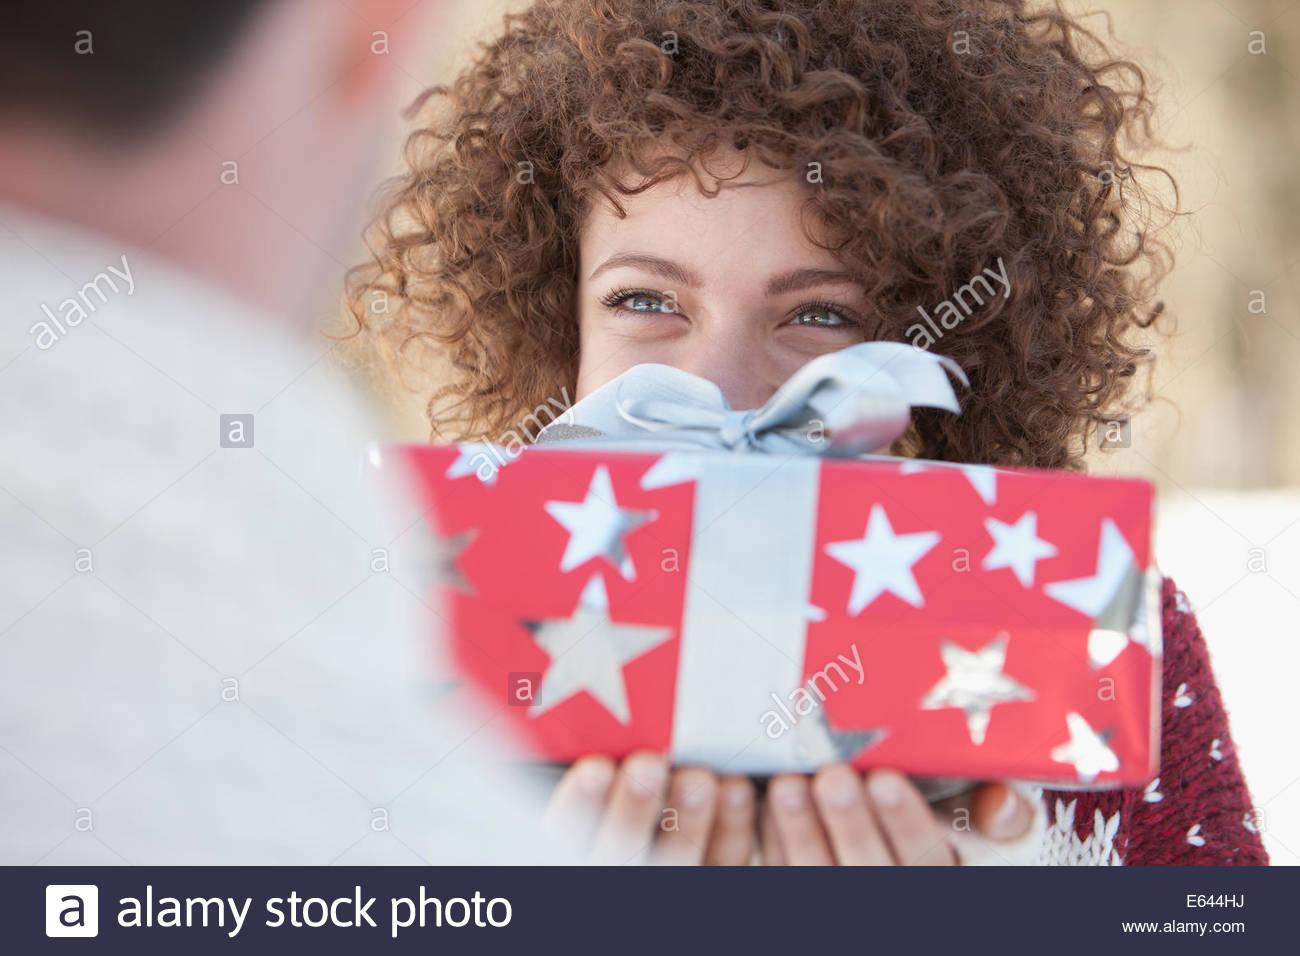 Woman giving man gift - Stock Image